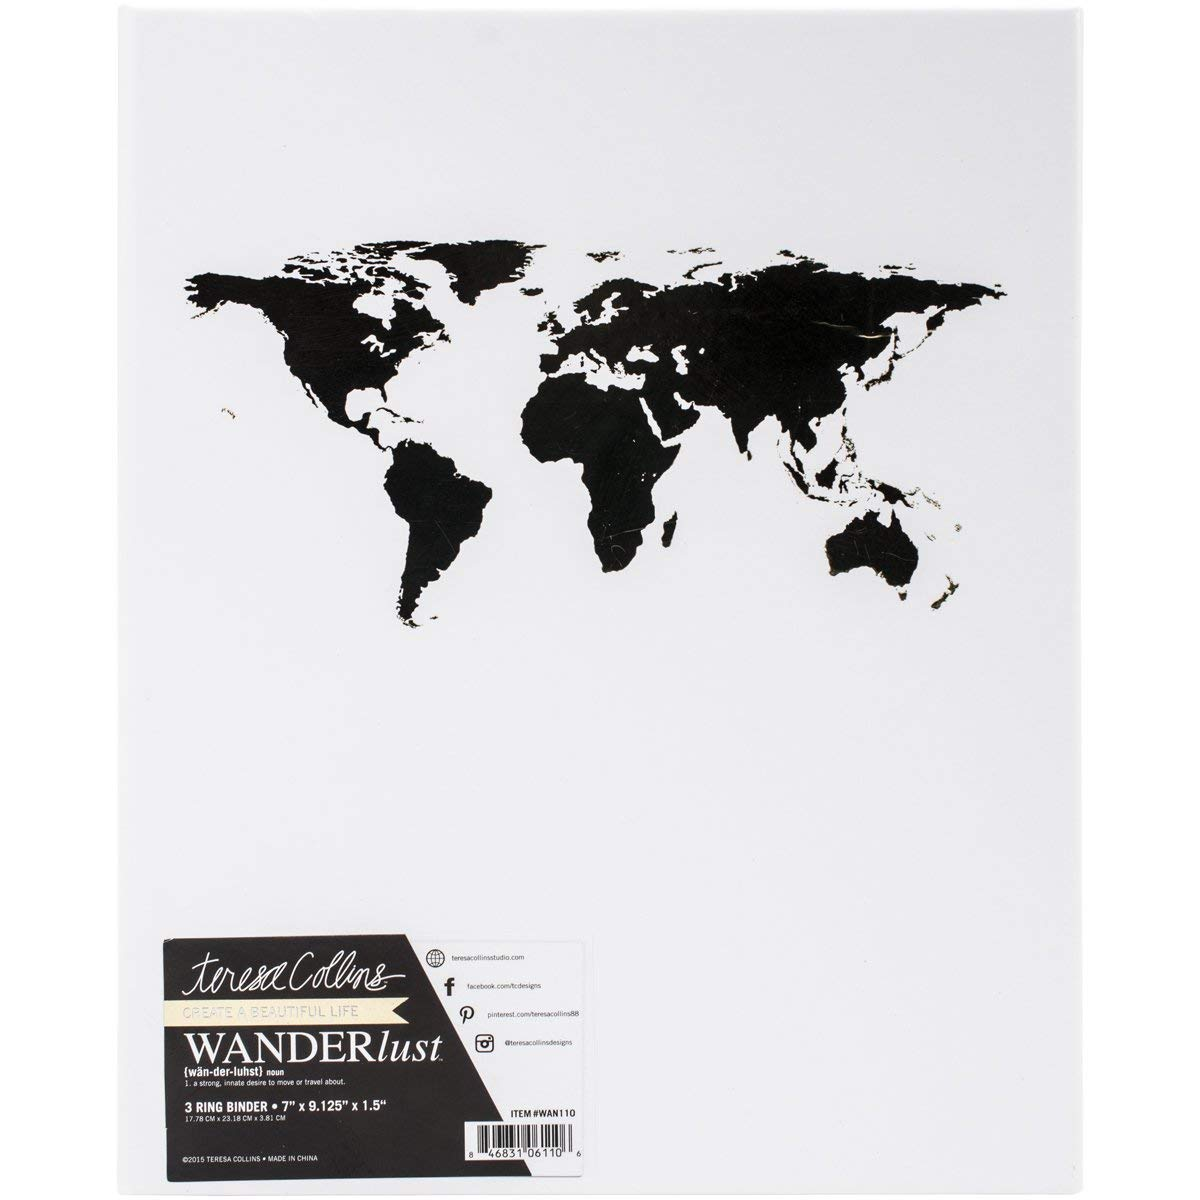 Teresa Collins archivador de cartón Wanderlust 17,78 cm x 23,18 cm,: Amazon.es: Hogar